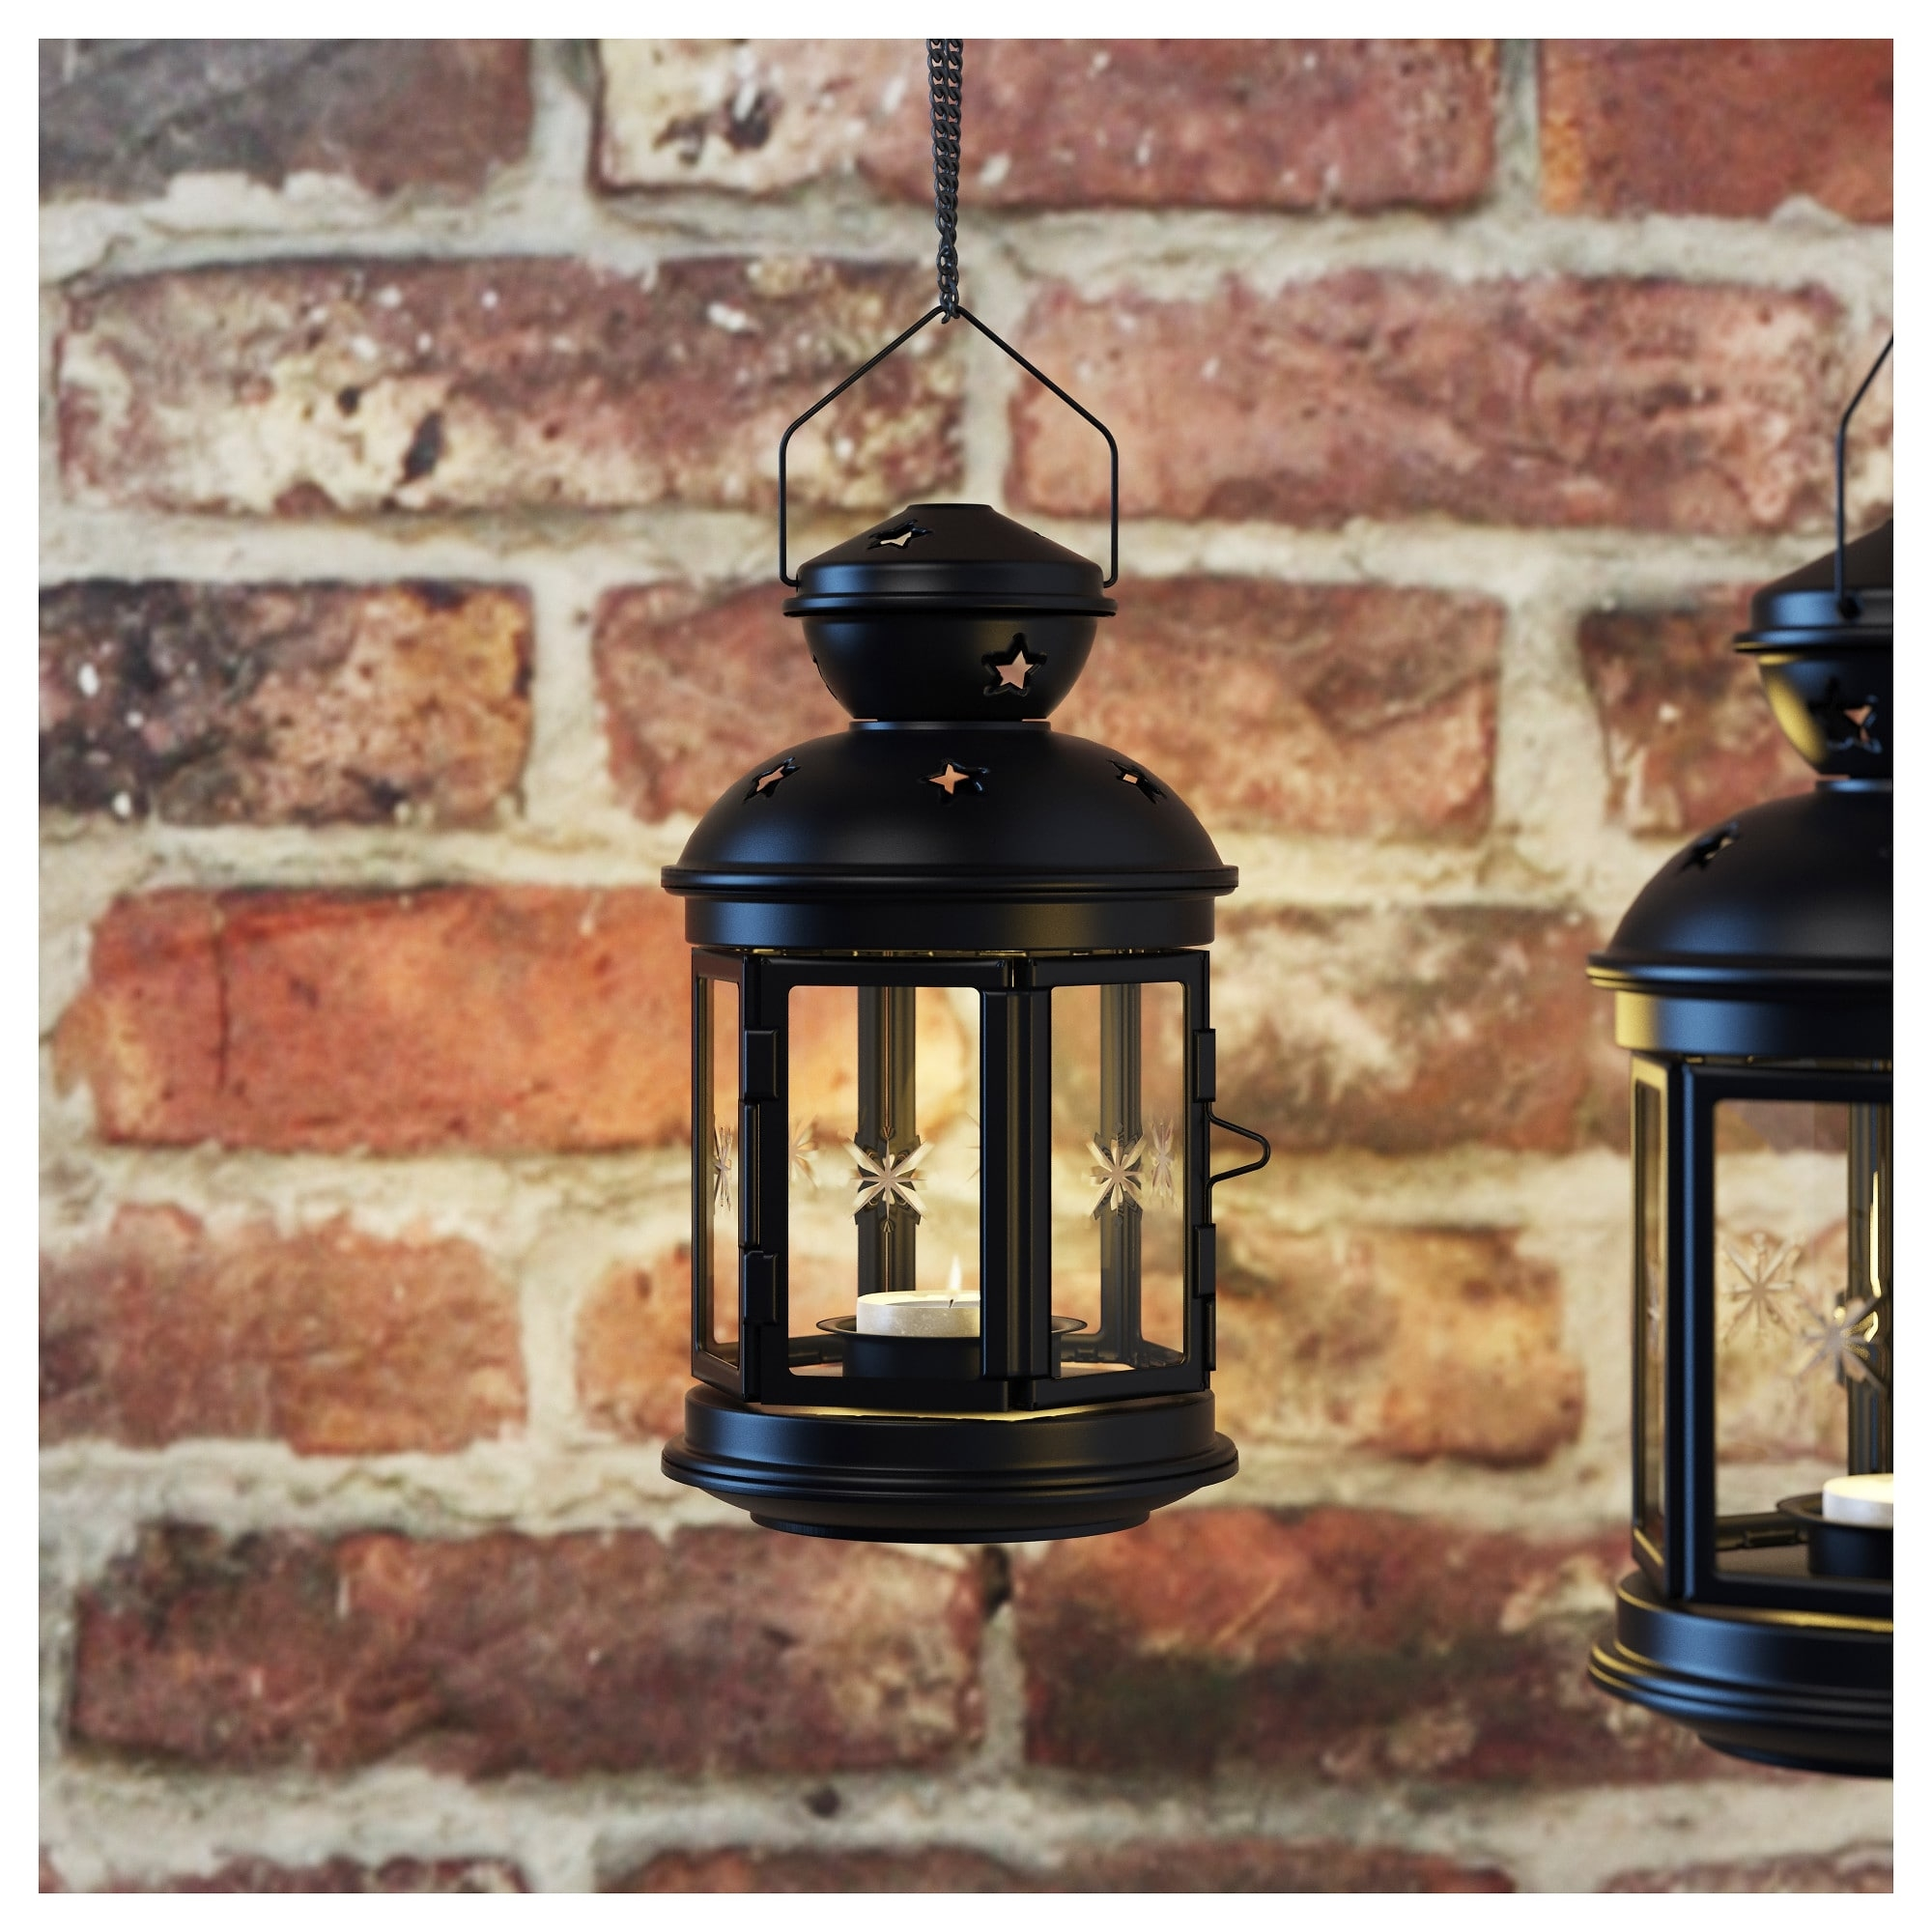 Rotera Lantern For Tealight - Ikea throughout Ikea Outdoor Lanterns (Image 15 of 20)